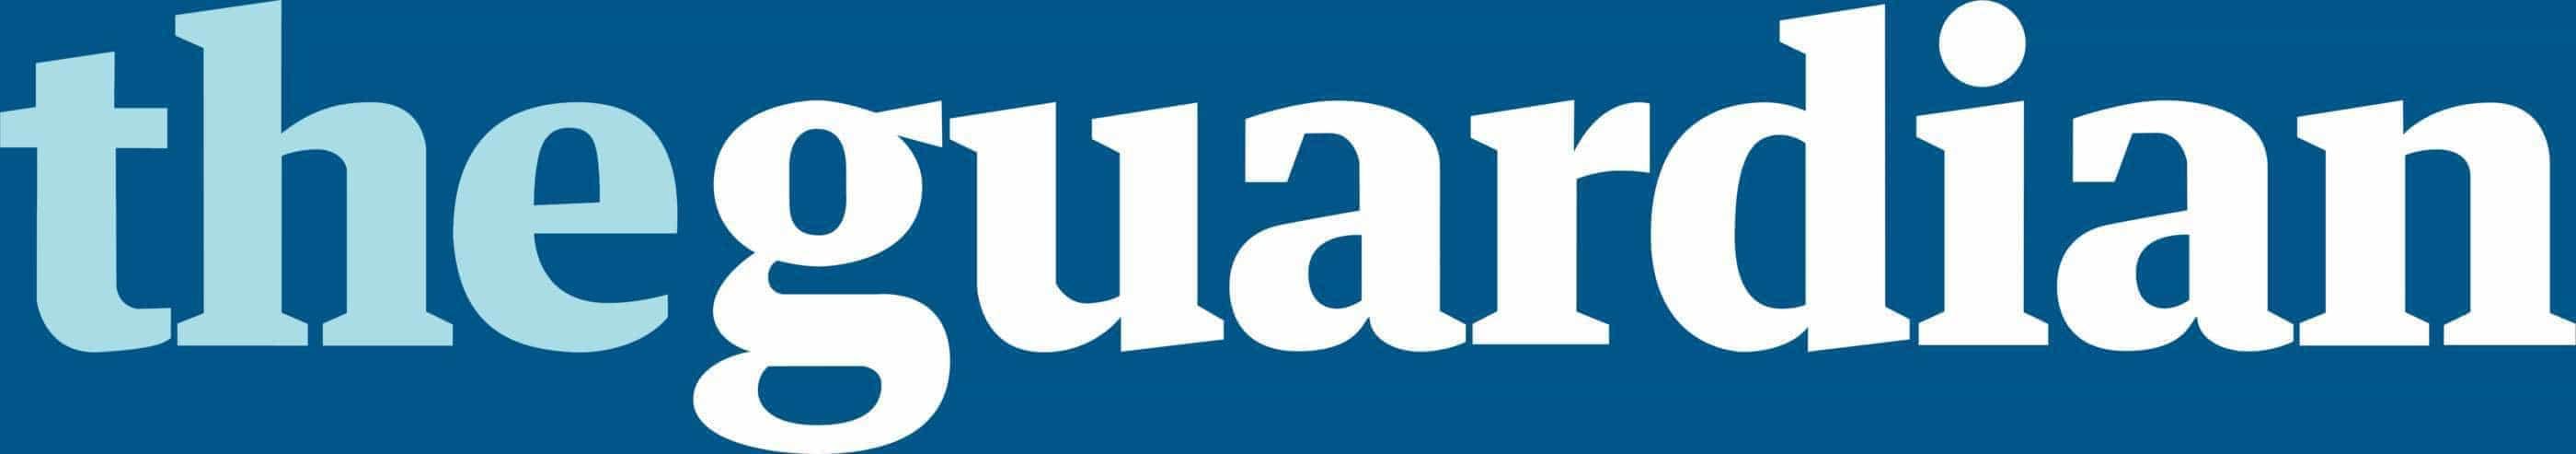 The_Guardian_logo_blue.jpeg